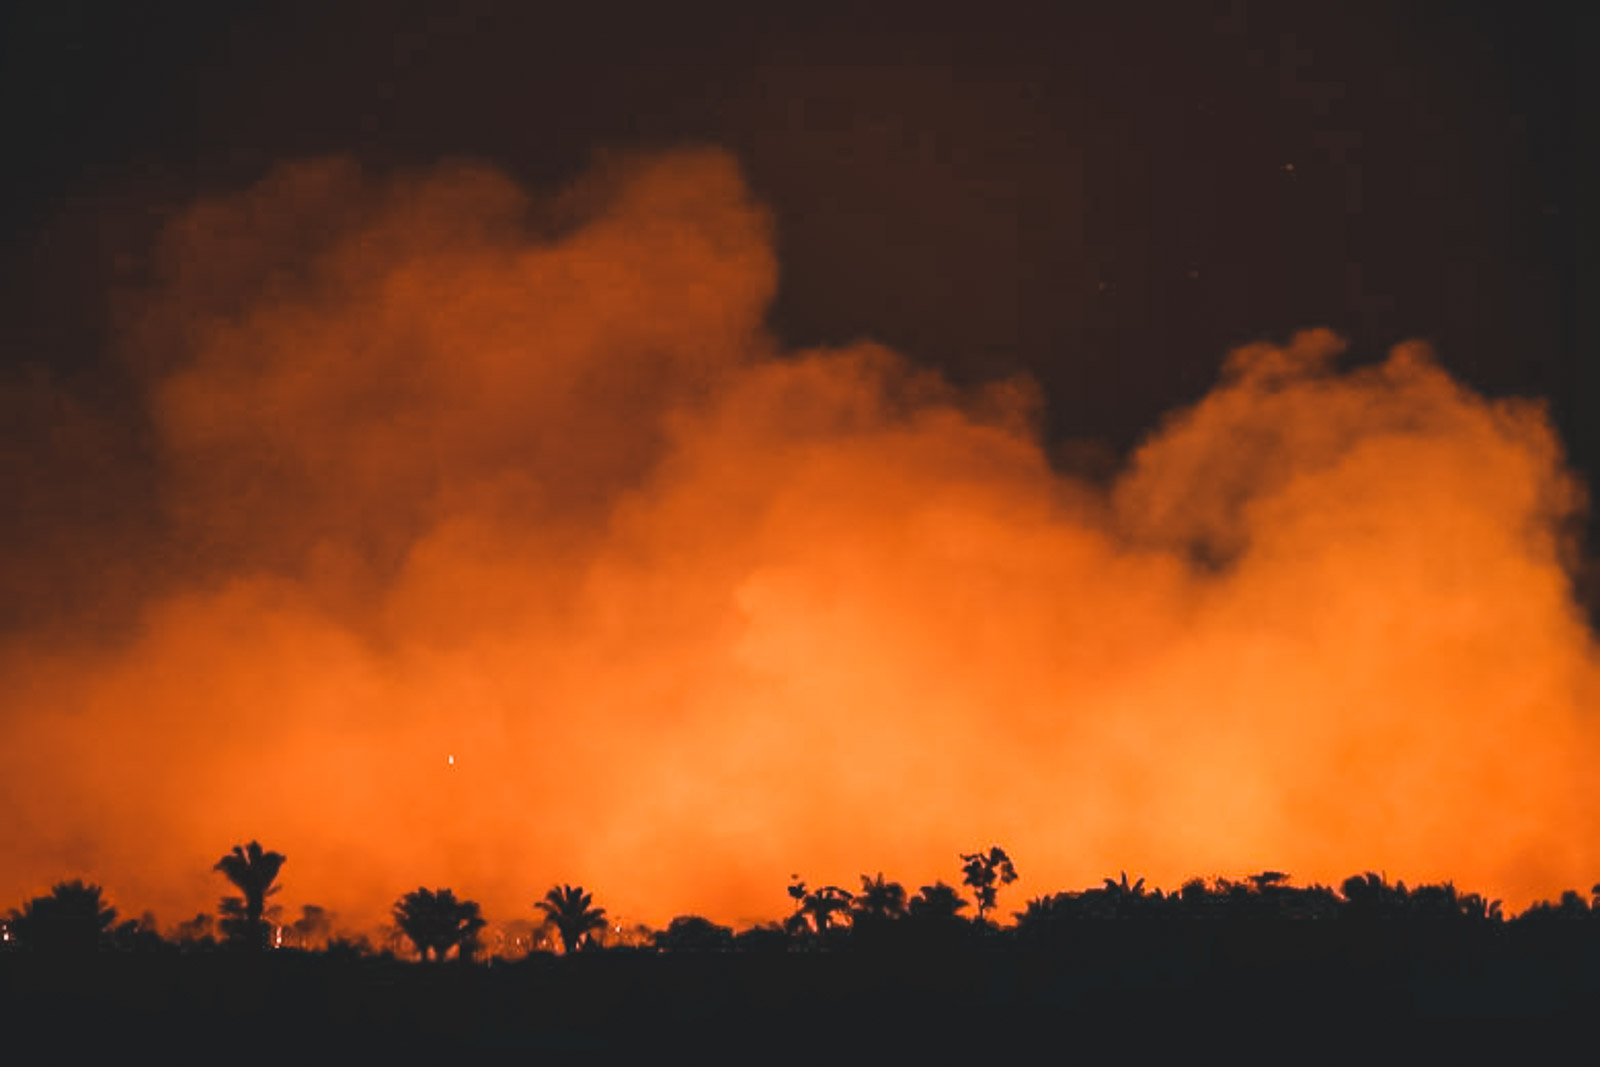 Amazonas, Regenwald, Amazonas brennt, Brände im Amazonas, Regenwald Brand, Brasilien Regenwald brennt, Feuer im Amazonas